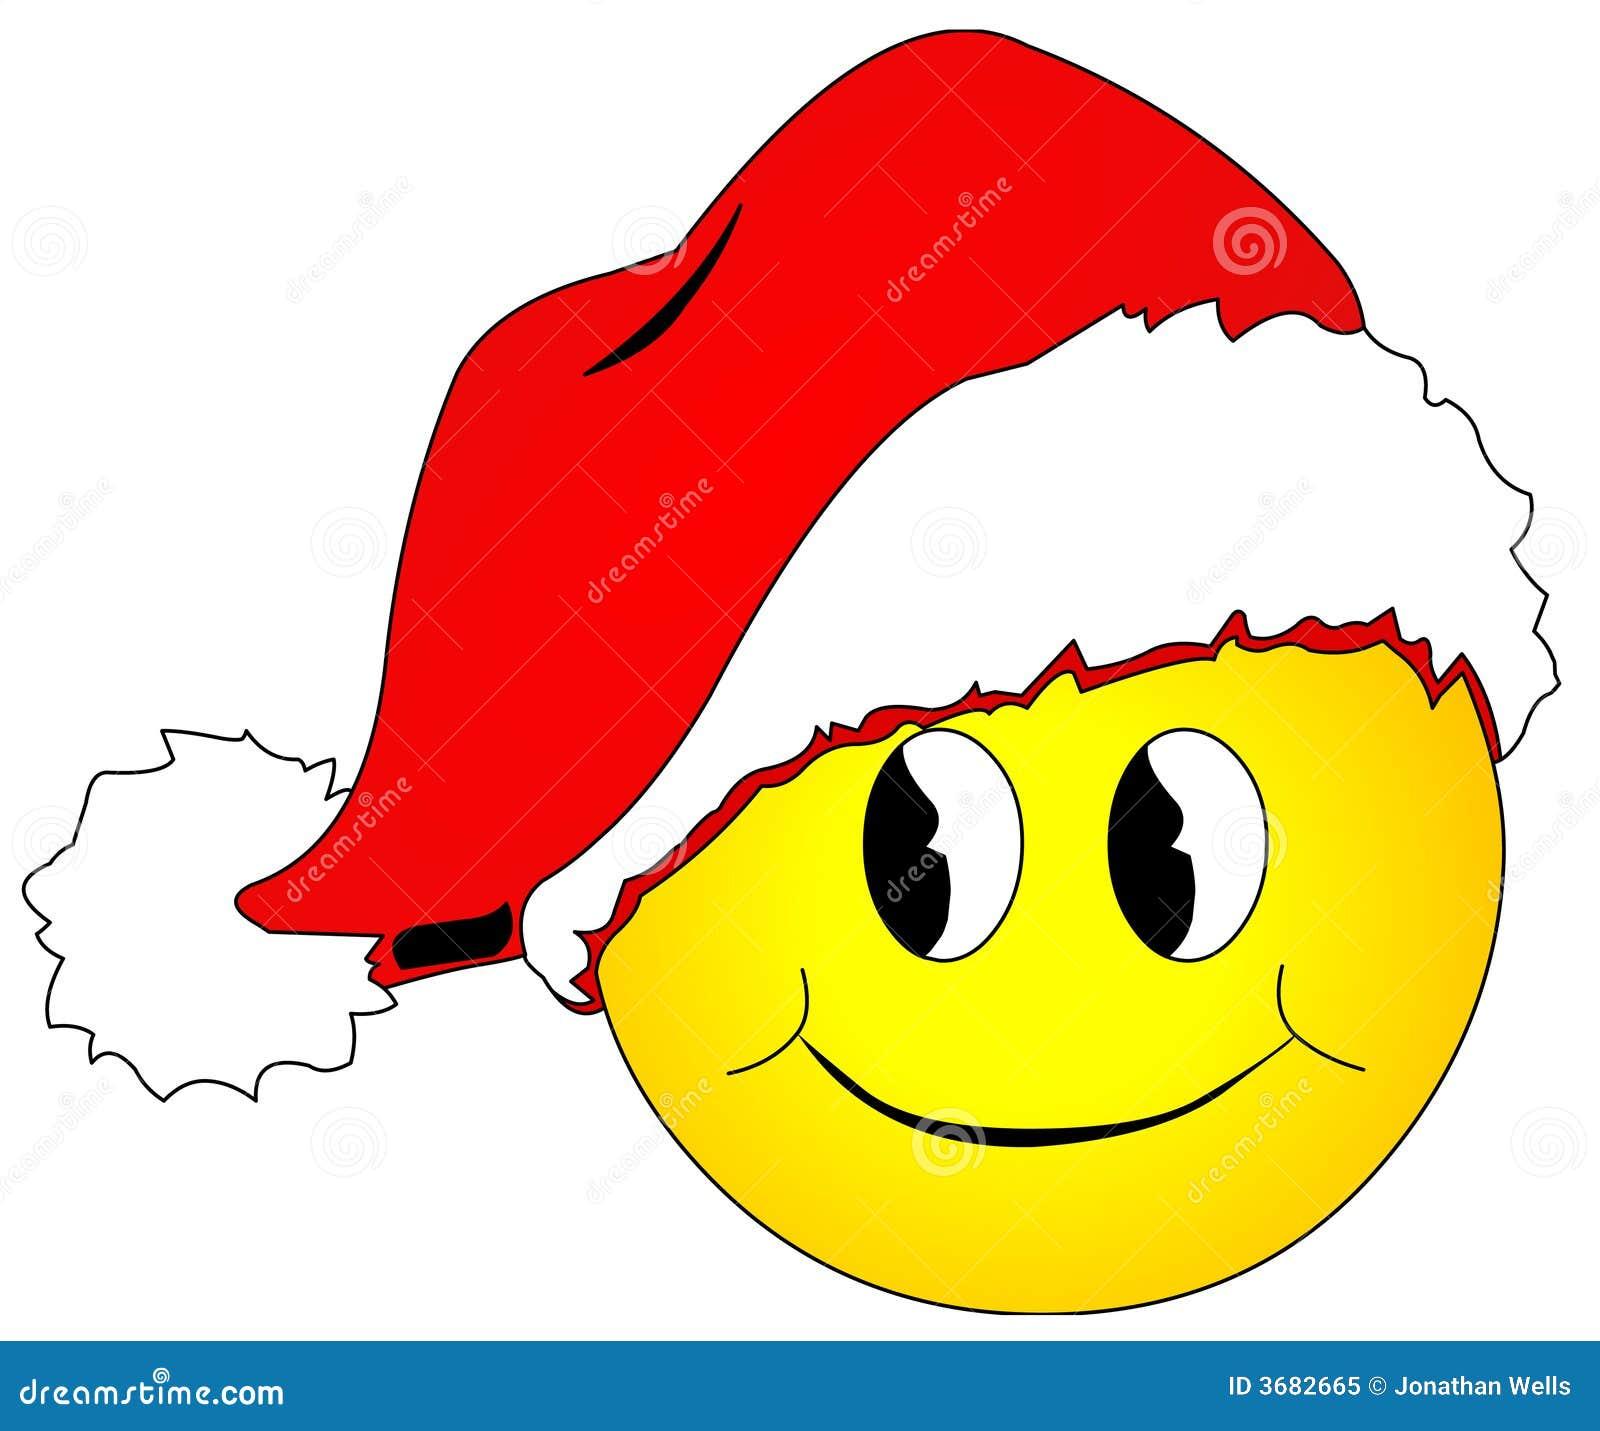 Christmas Smiley Royalty Free Stock Photo - Image: 3682665